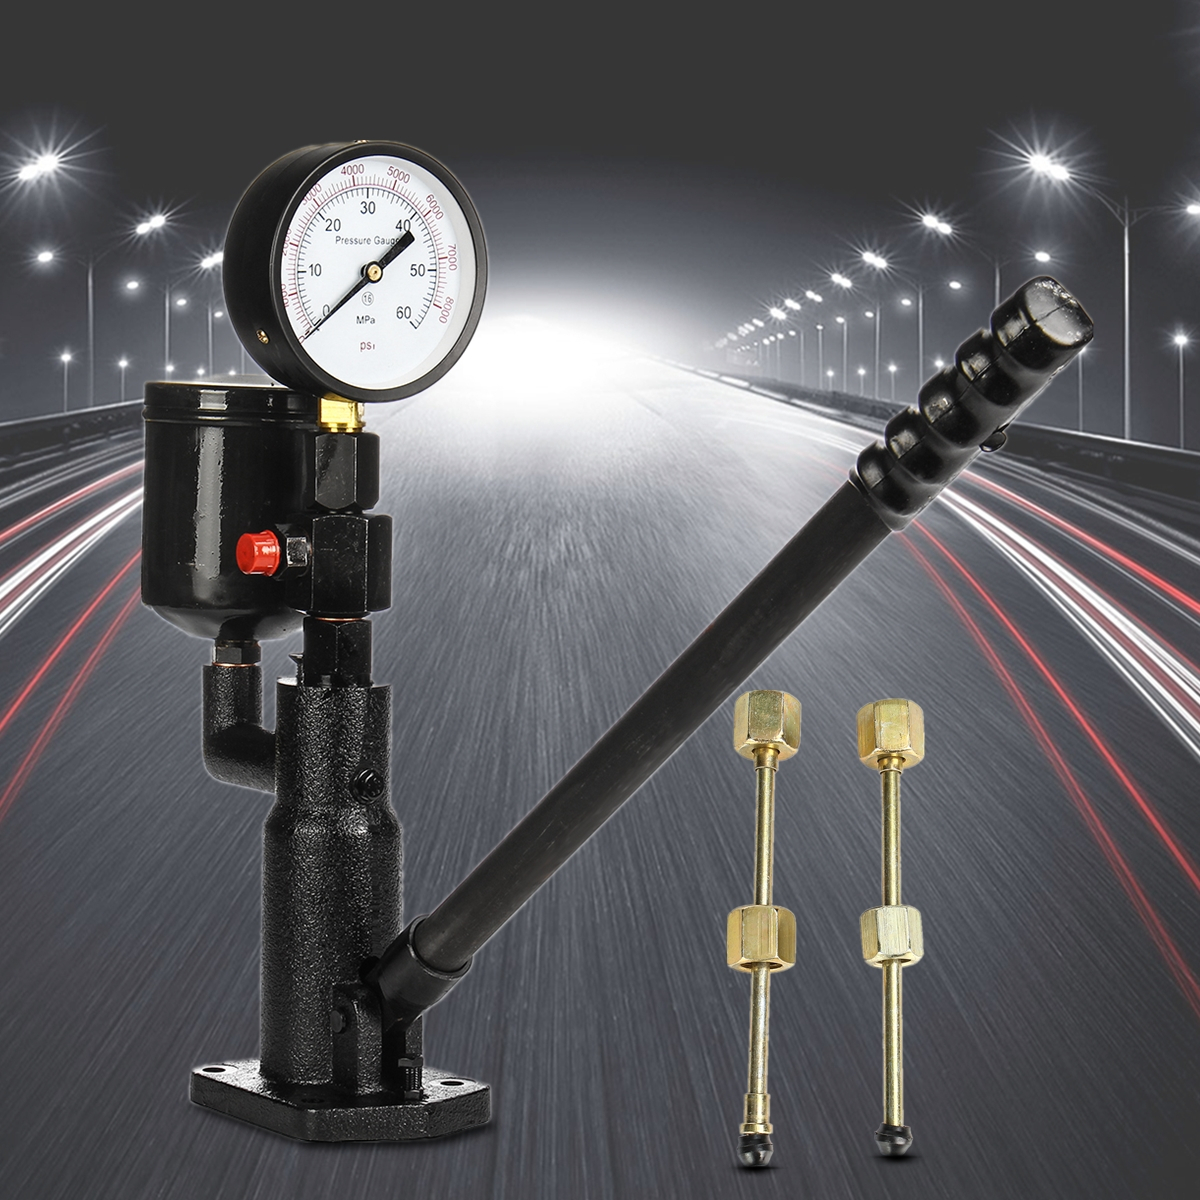 Dual Scale Read Gauge Bar/PSI 0-60Mpa 1L Pop Diesel/Injector Nozzle Pressure Tester Steel Black High Pressure Pipe Diagnostic цены